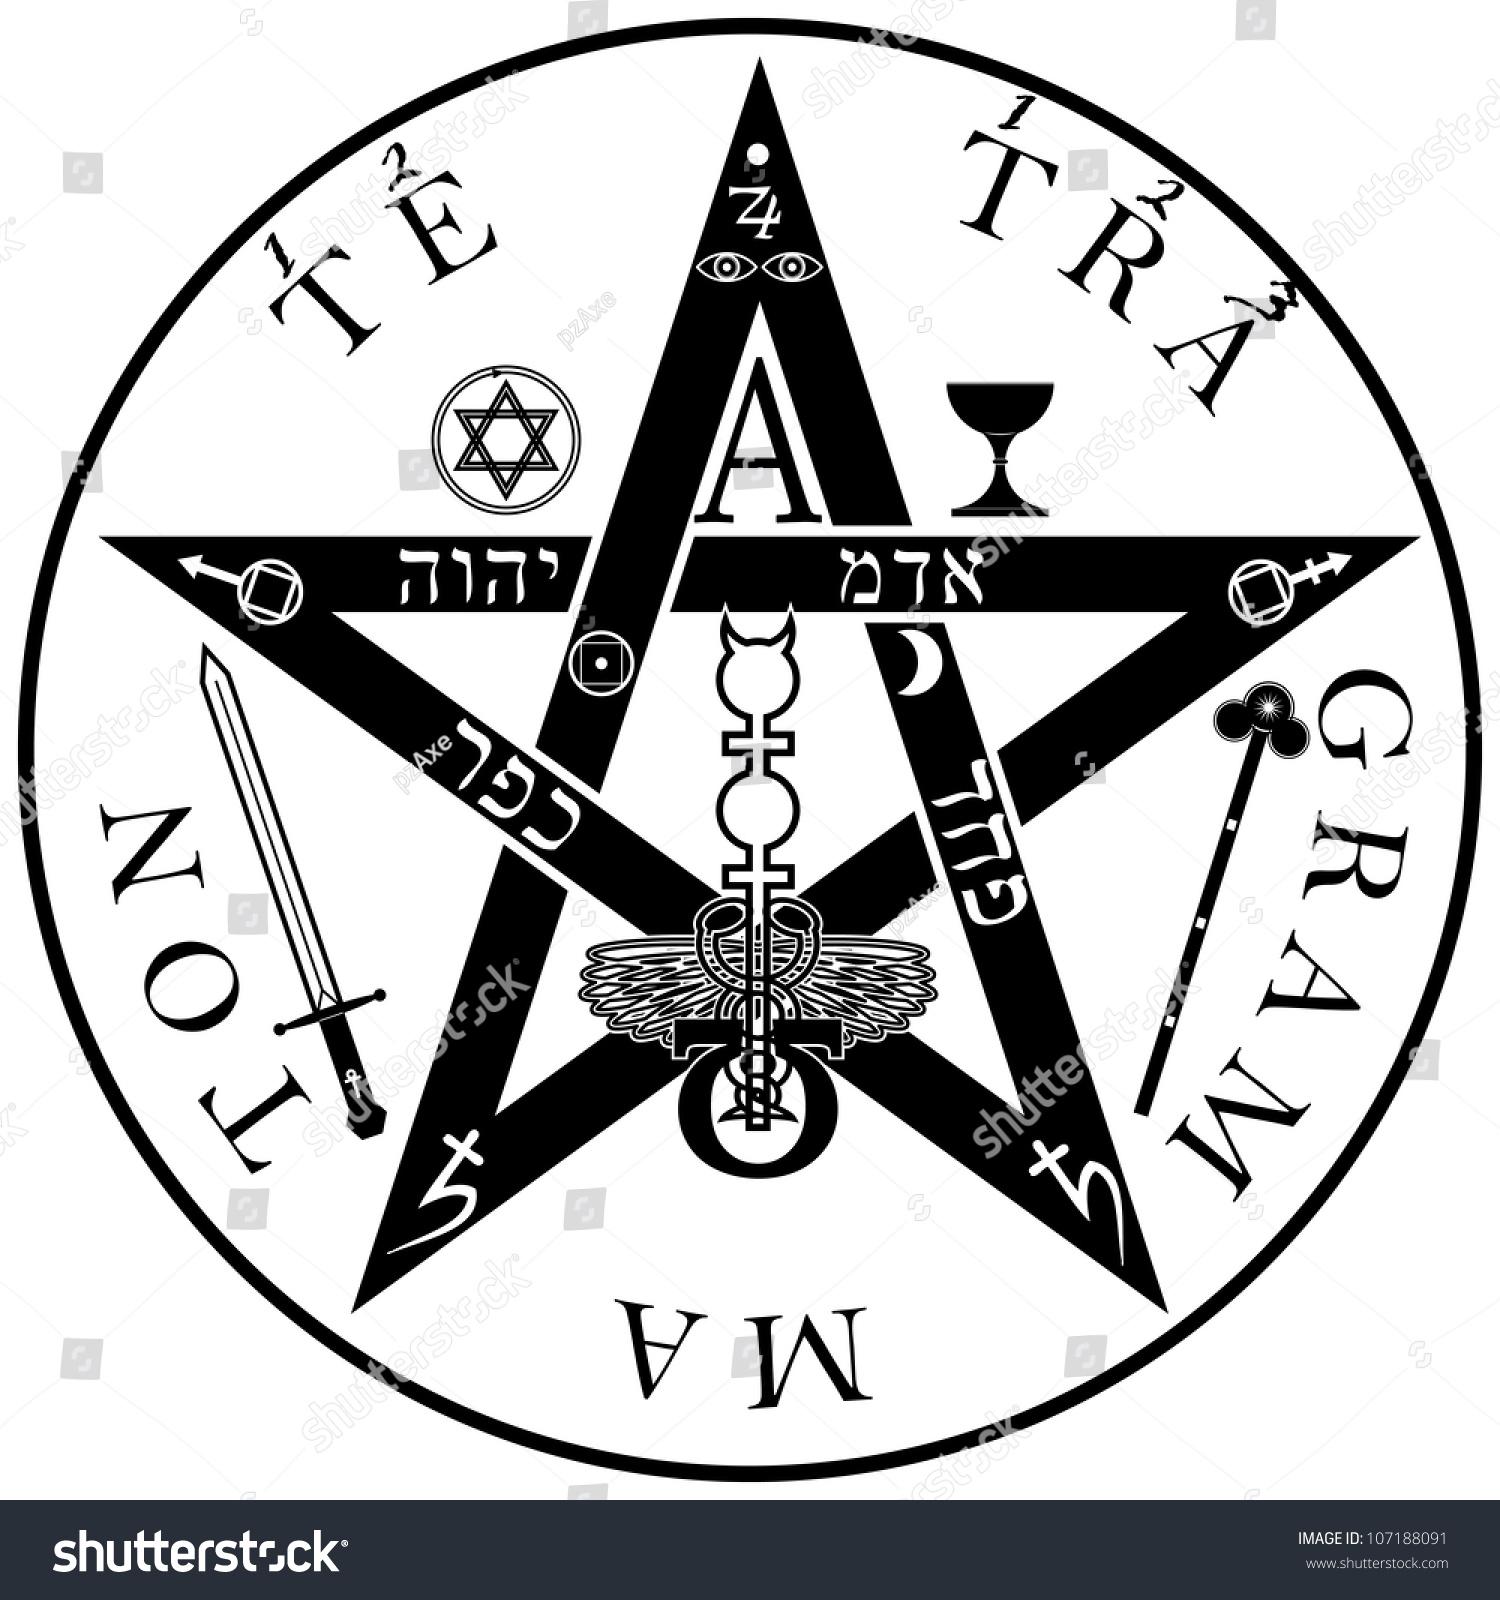 Tetragrammaton Pentagram Symbol Meaning